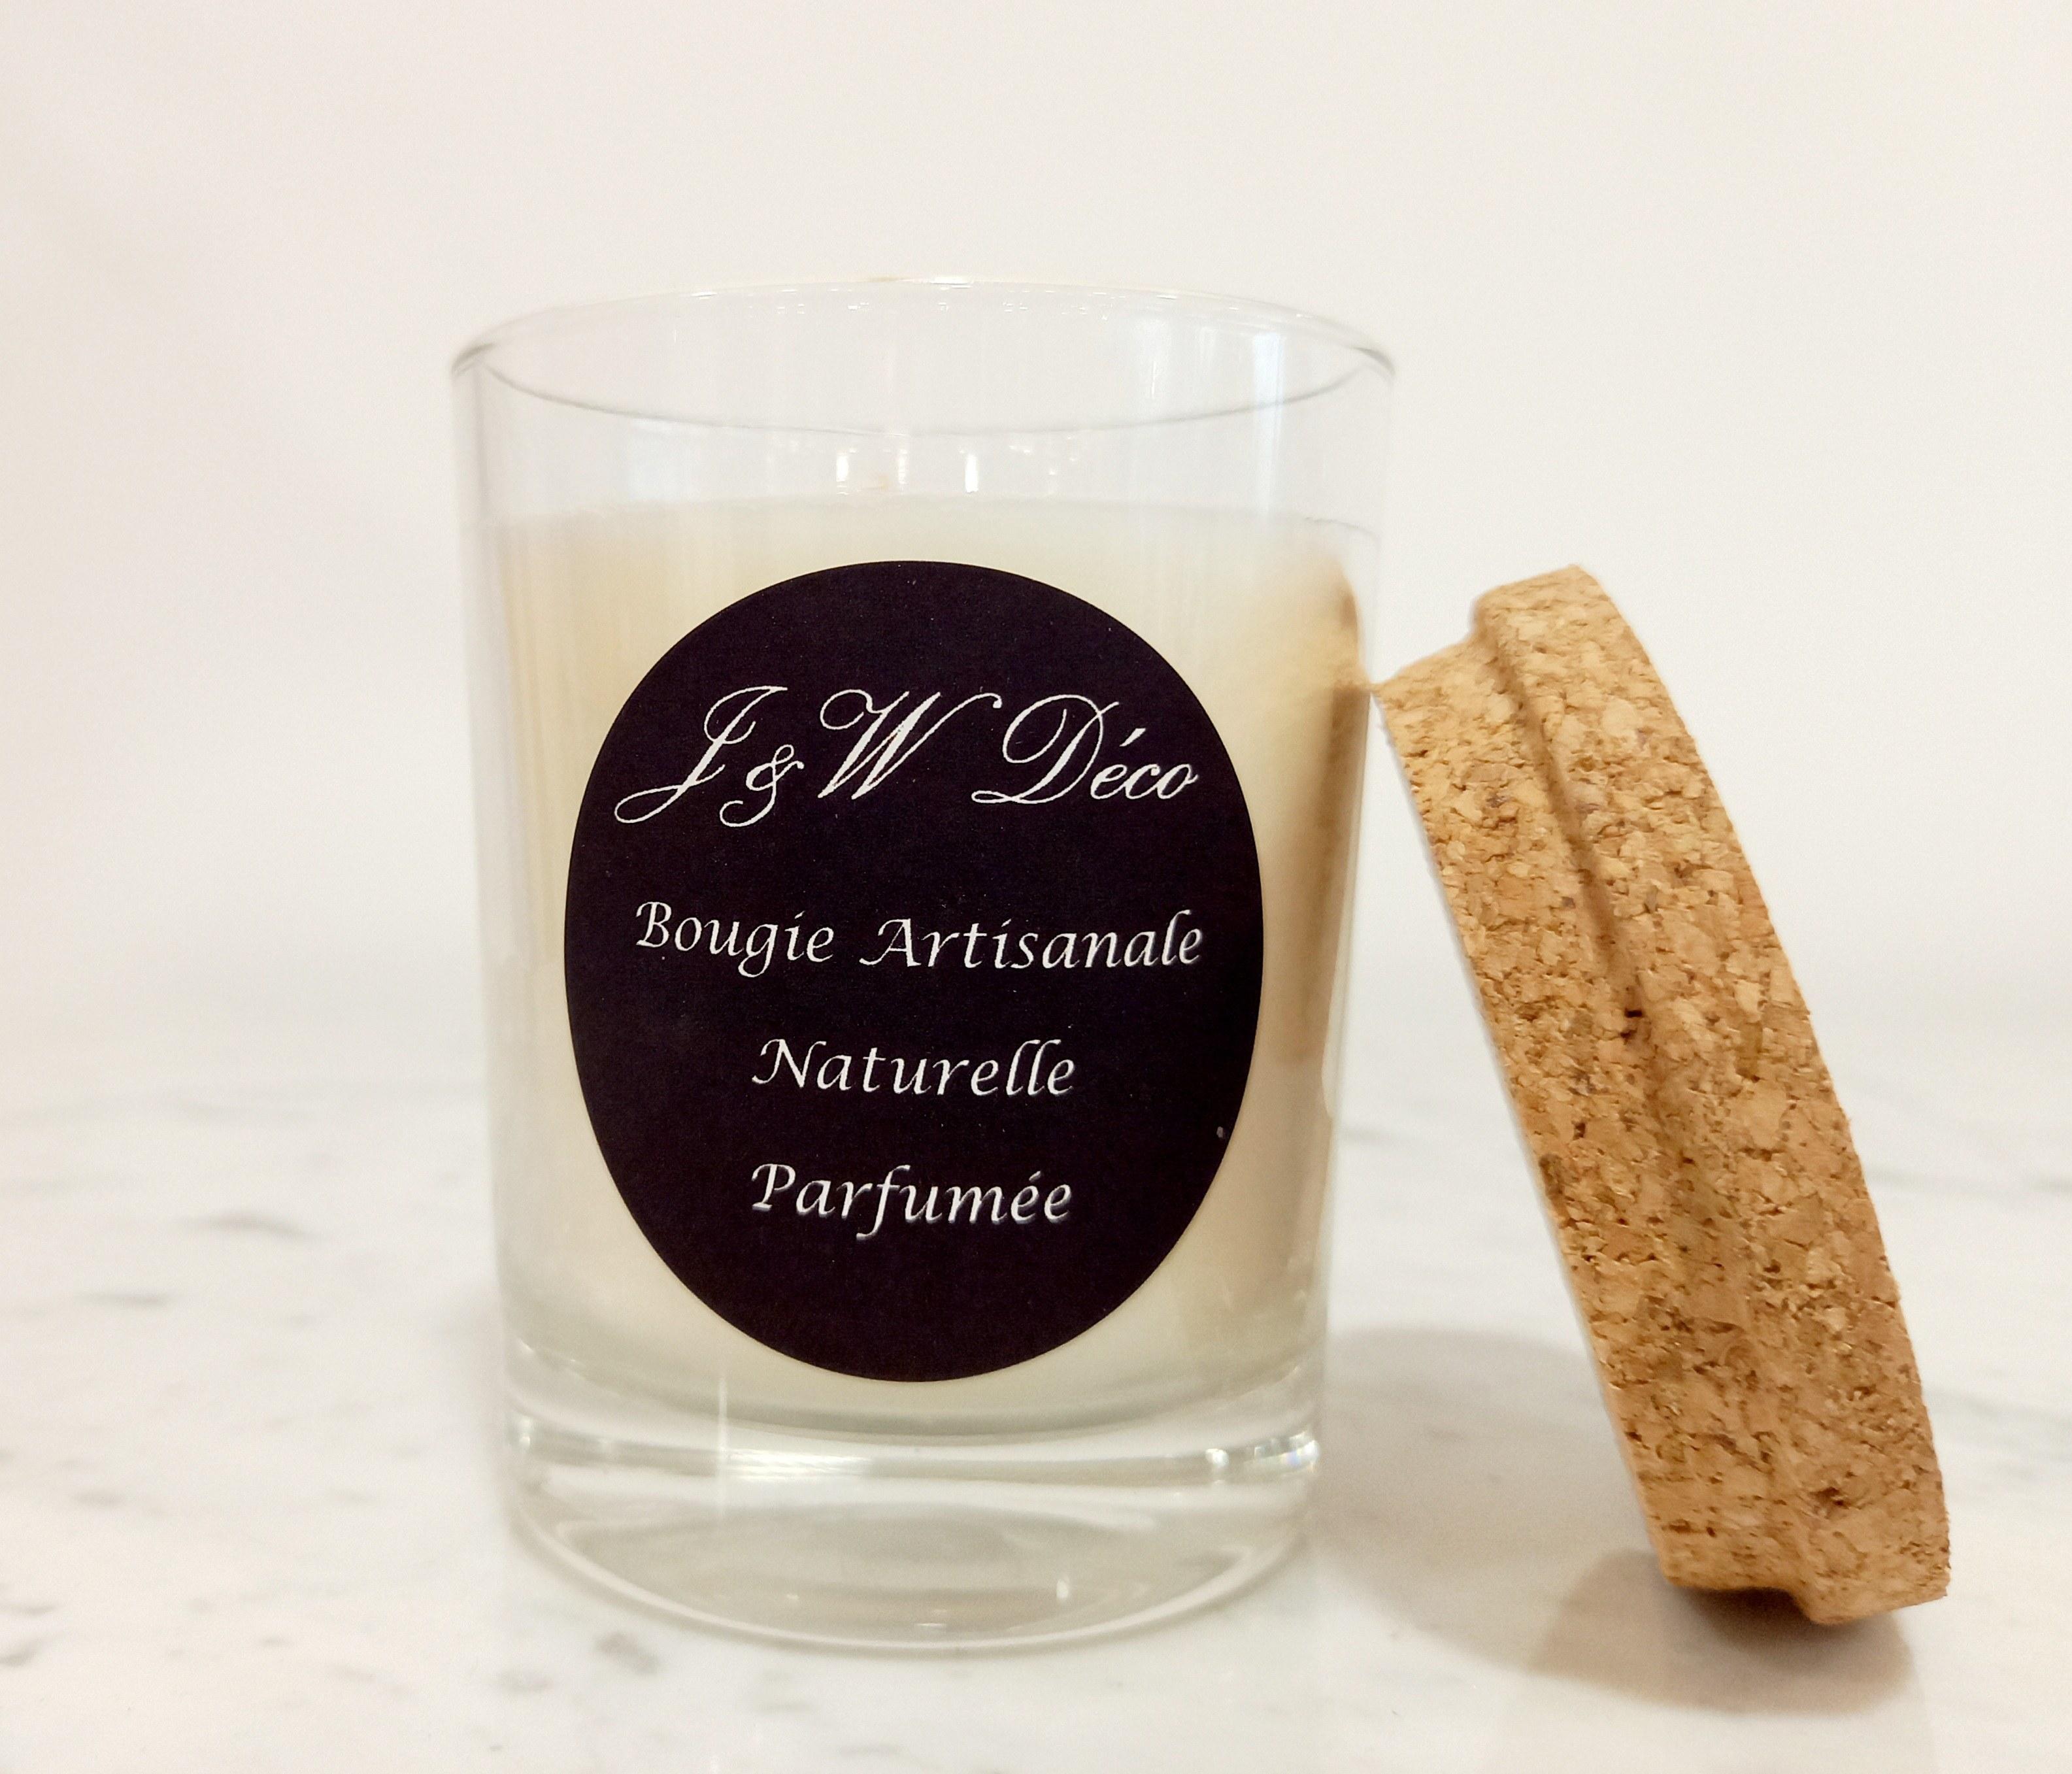 Bougies artisanales 130g couvercle liège2